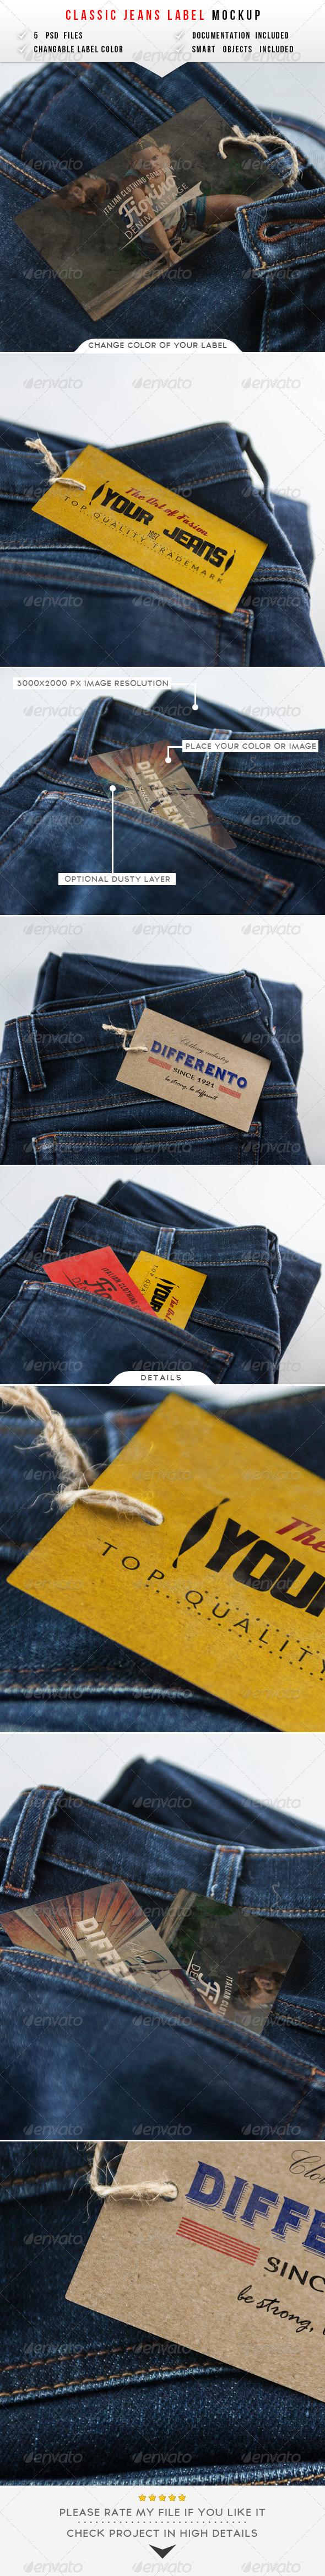 GraphicRiver Jeans Label Mockup 8143458